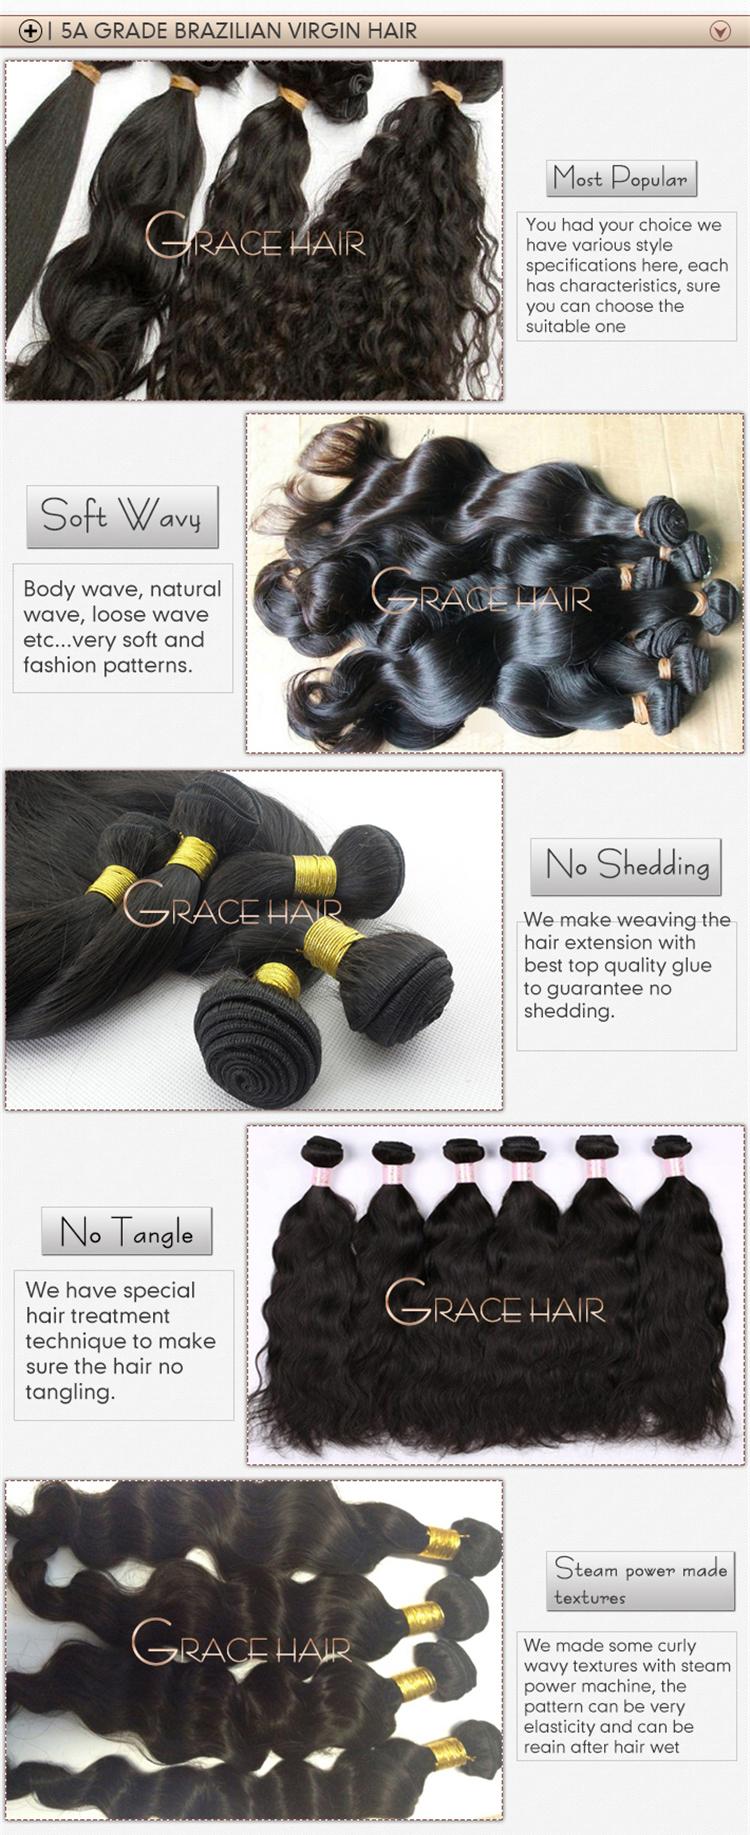 Grace curly best quality virgin brazilian human hair sew in weave grace curly best quality virgin brazilian human hair sew in weave geenschuldenfo Choice Image